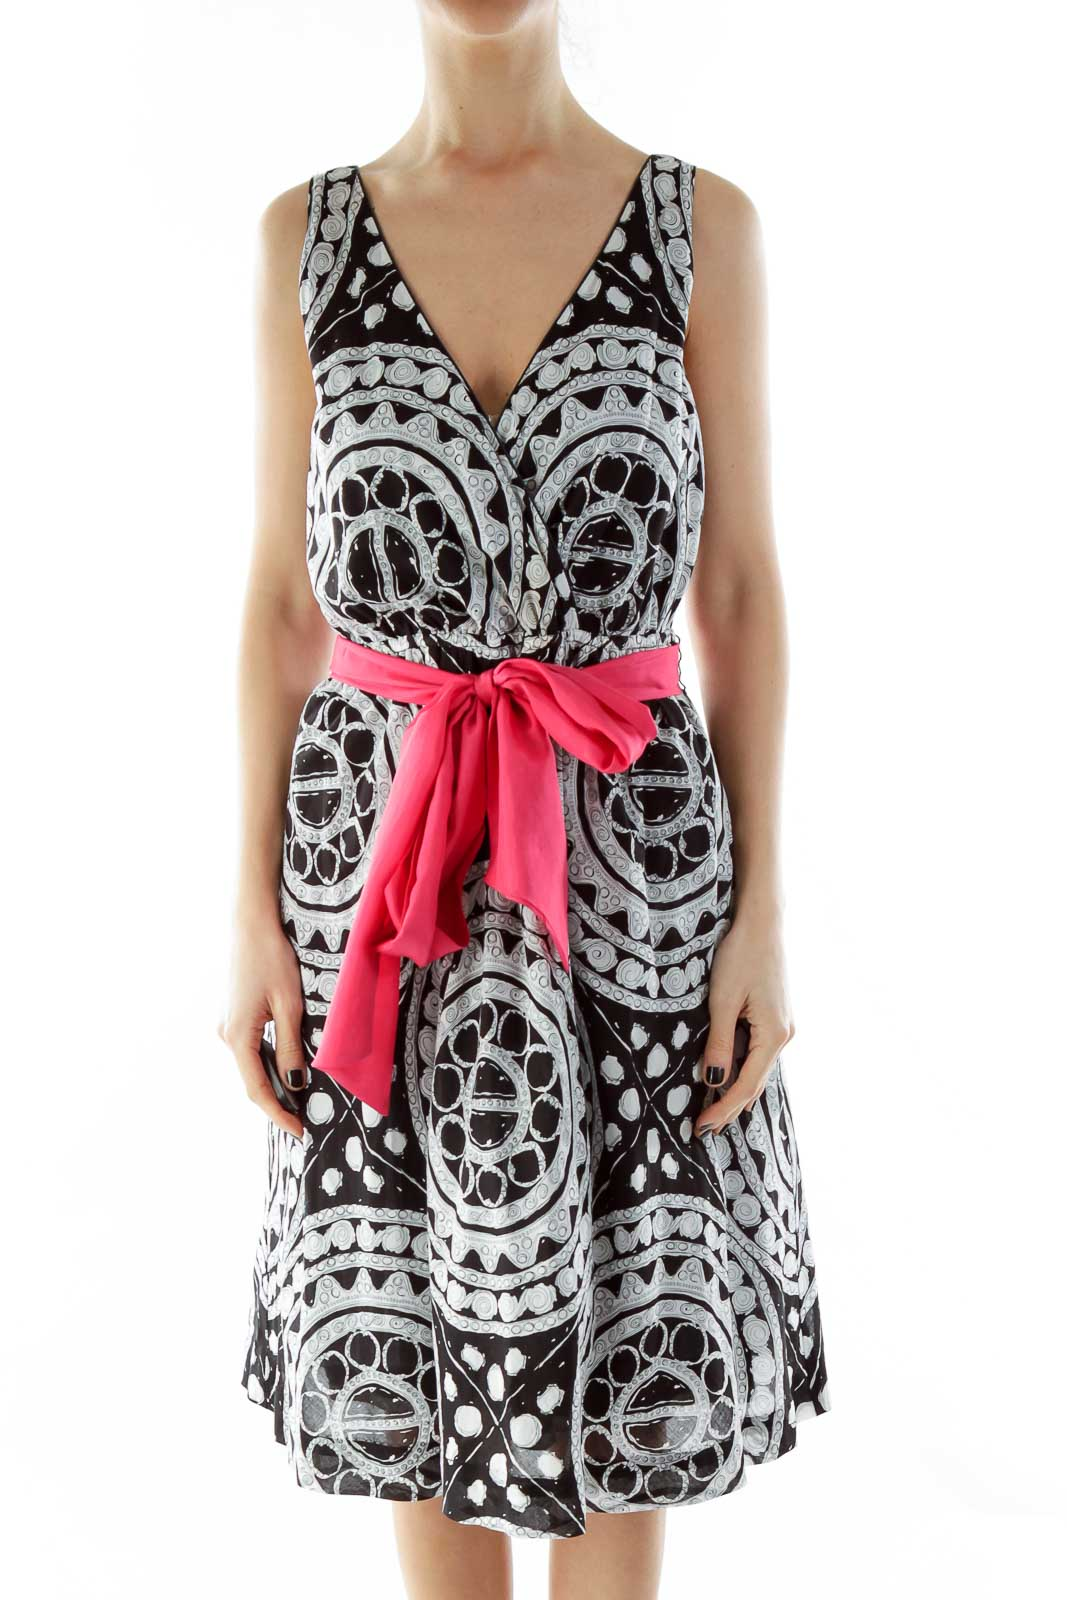 Black White Pink V-Neck Print Dress with Sash